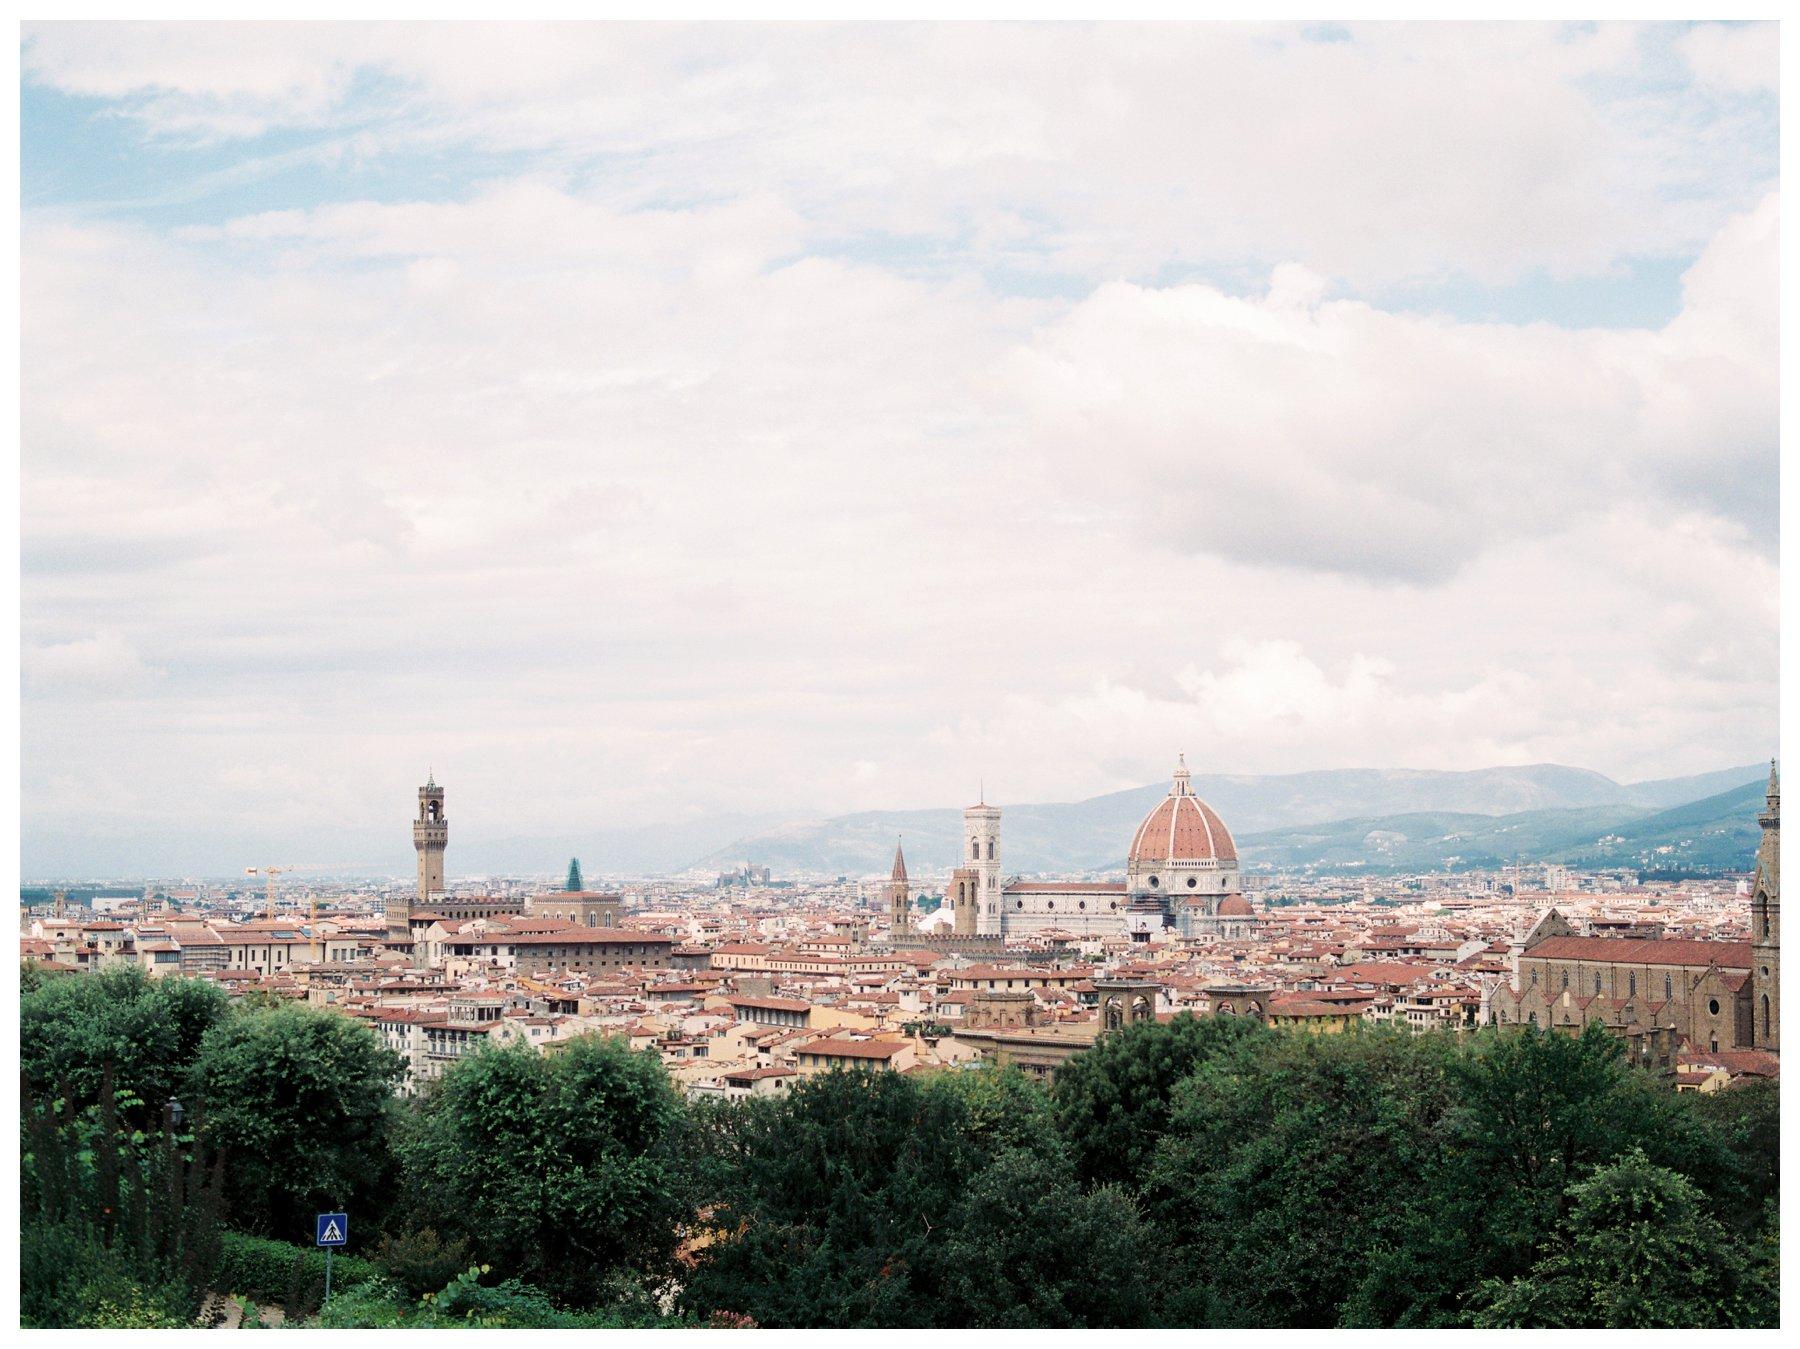 fine art travel photography of Florence skyline from Villa la Vedetta